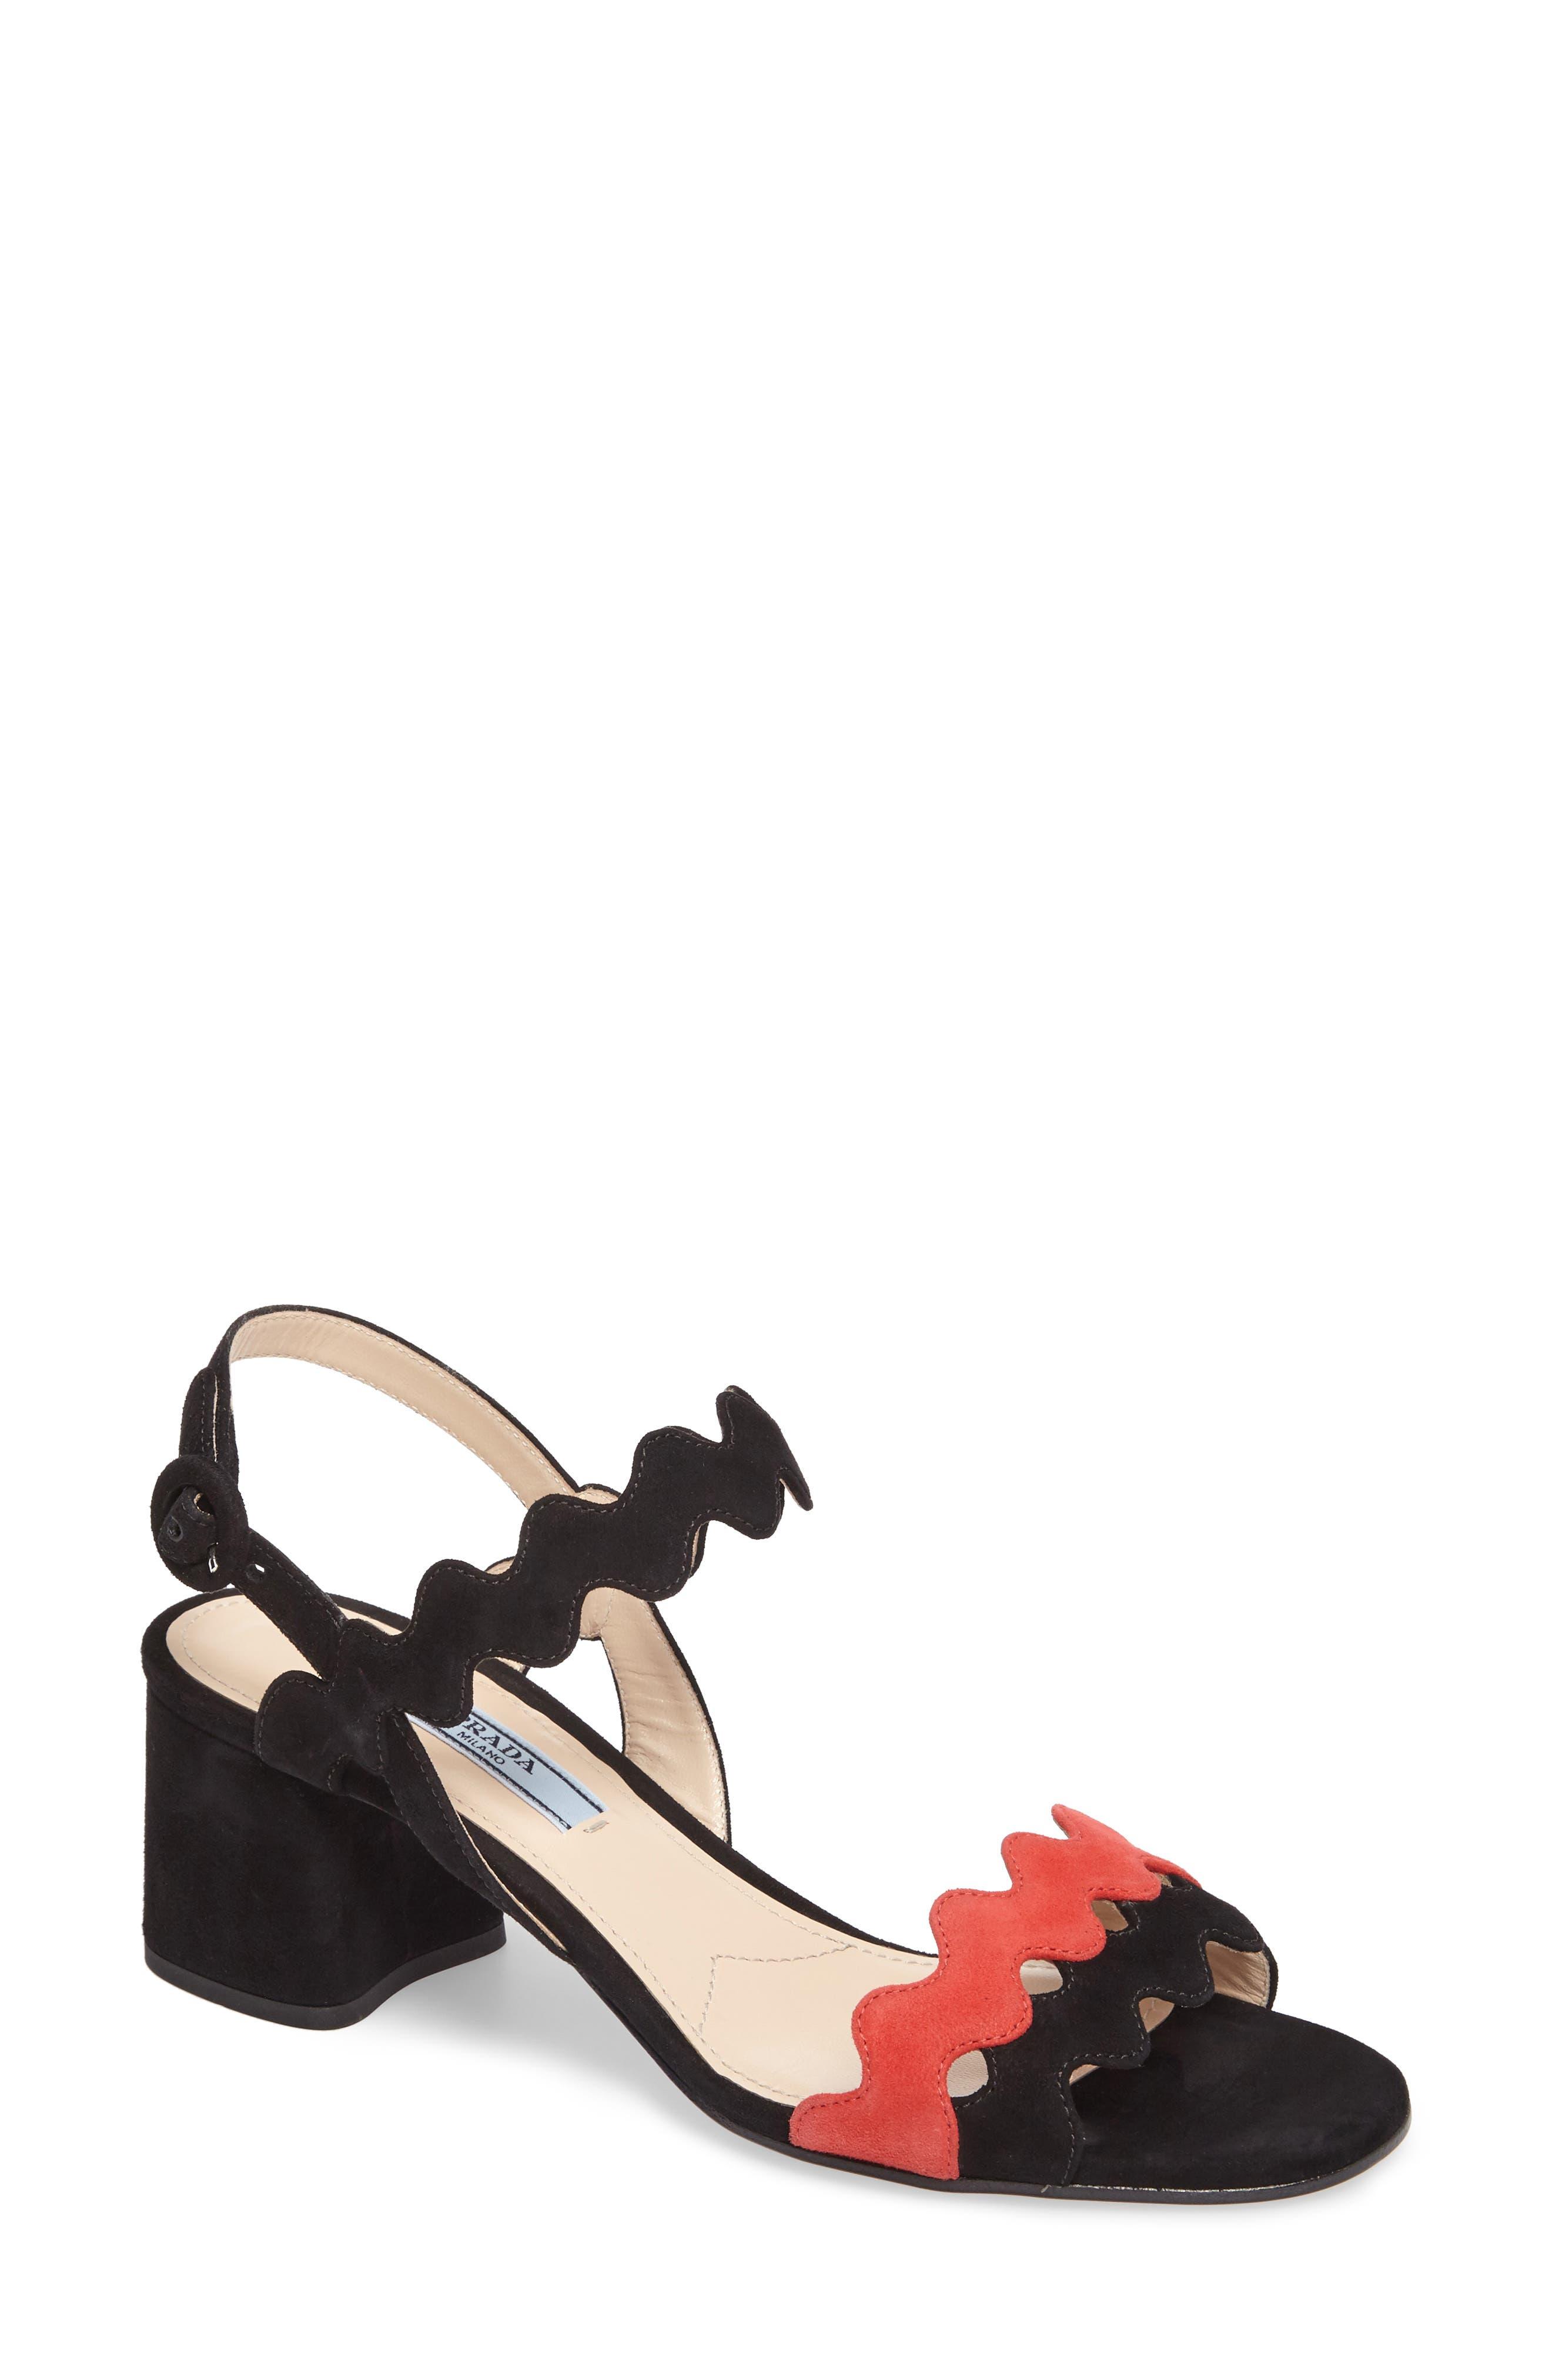 Main Image - Prada Double Strap Wave Sandal (Women)